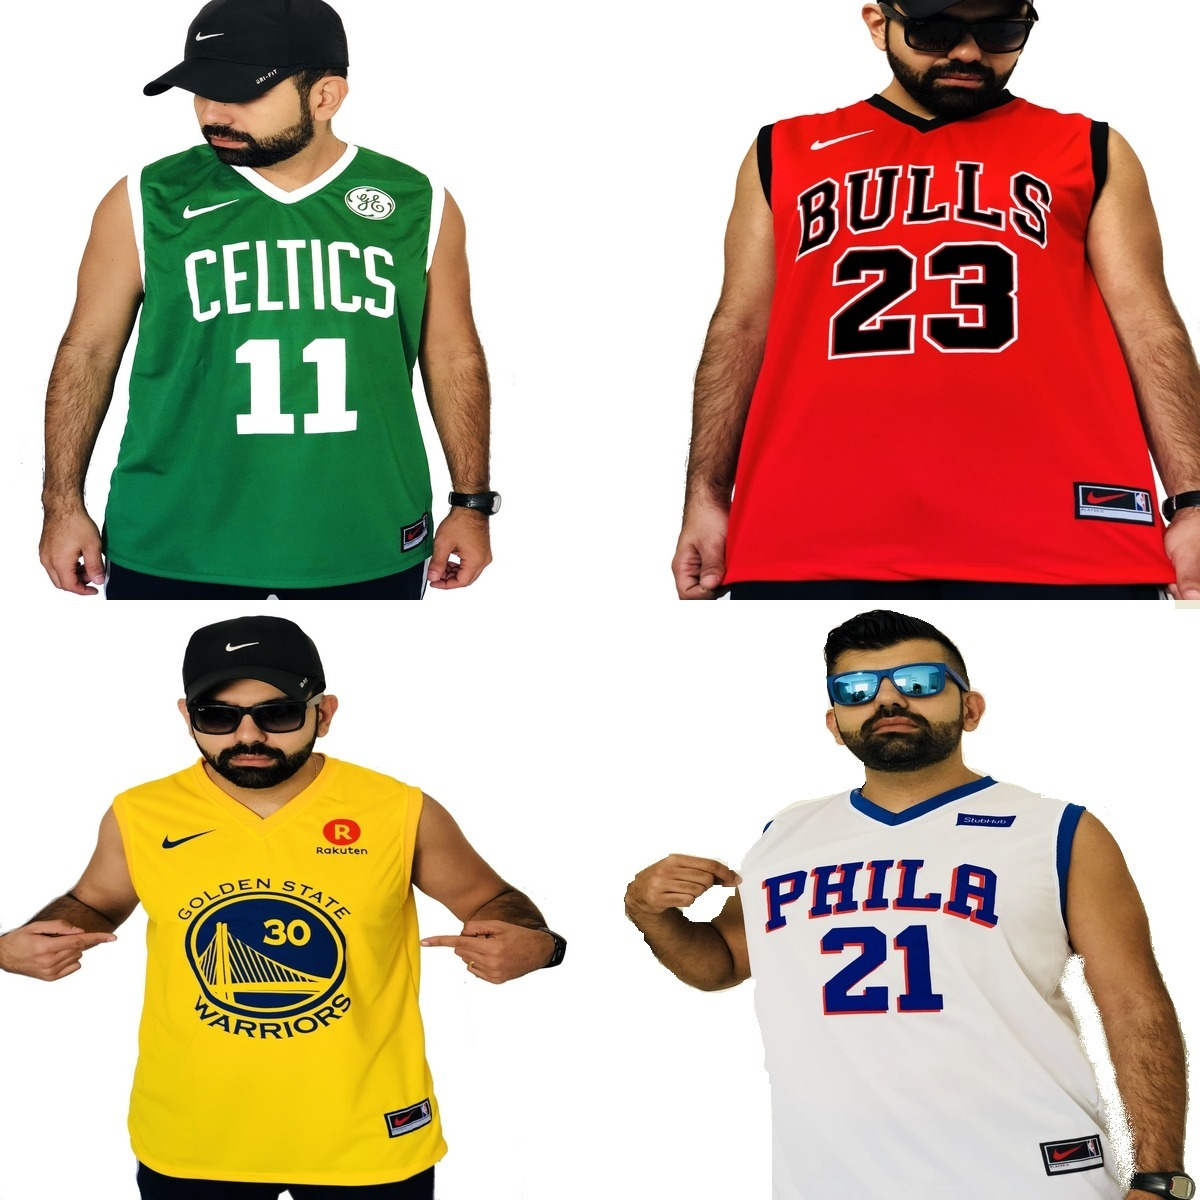 kit 5 camiseta regata basquete nba revenda atacado dri fit. Carregando zoom. 39fedd71ed1d8